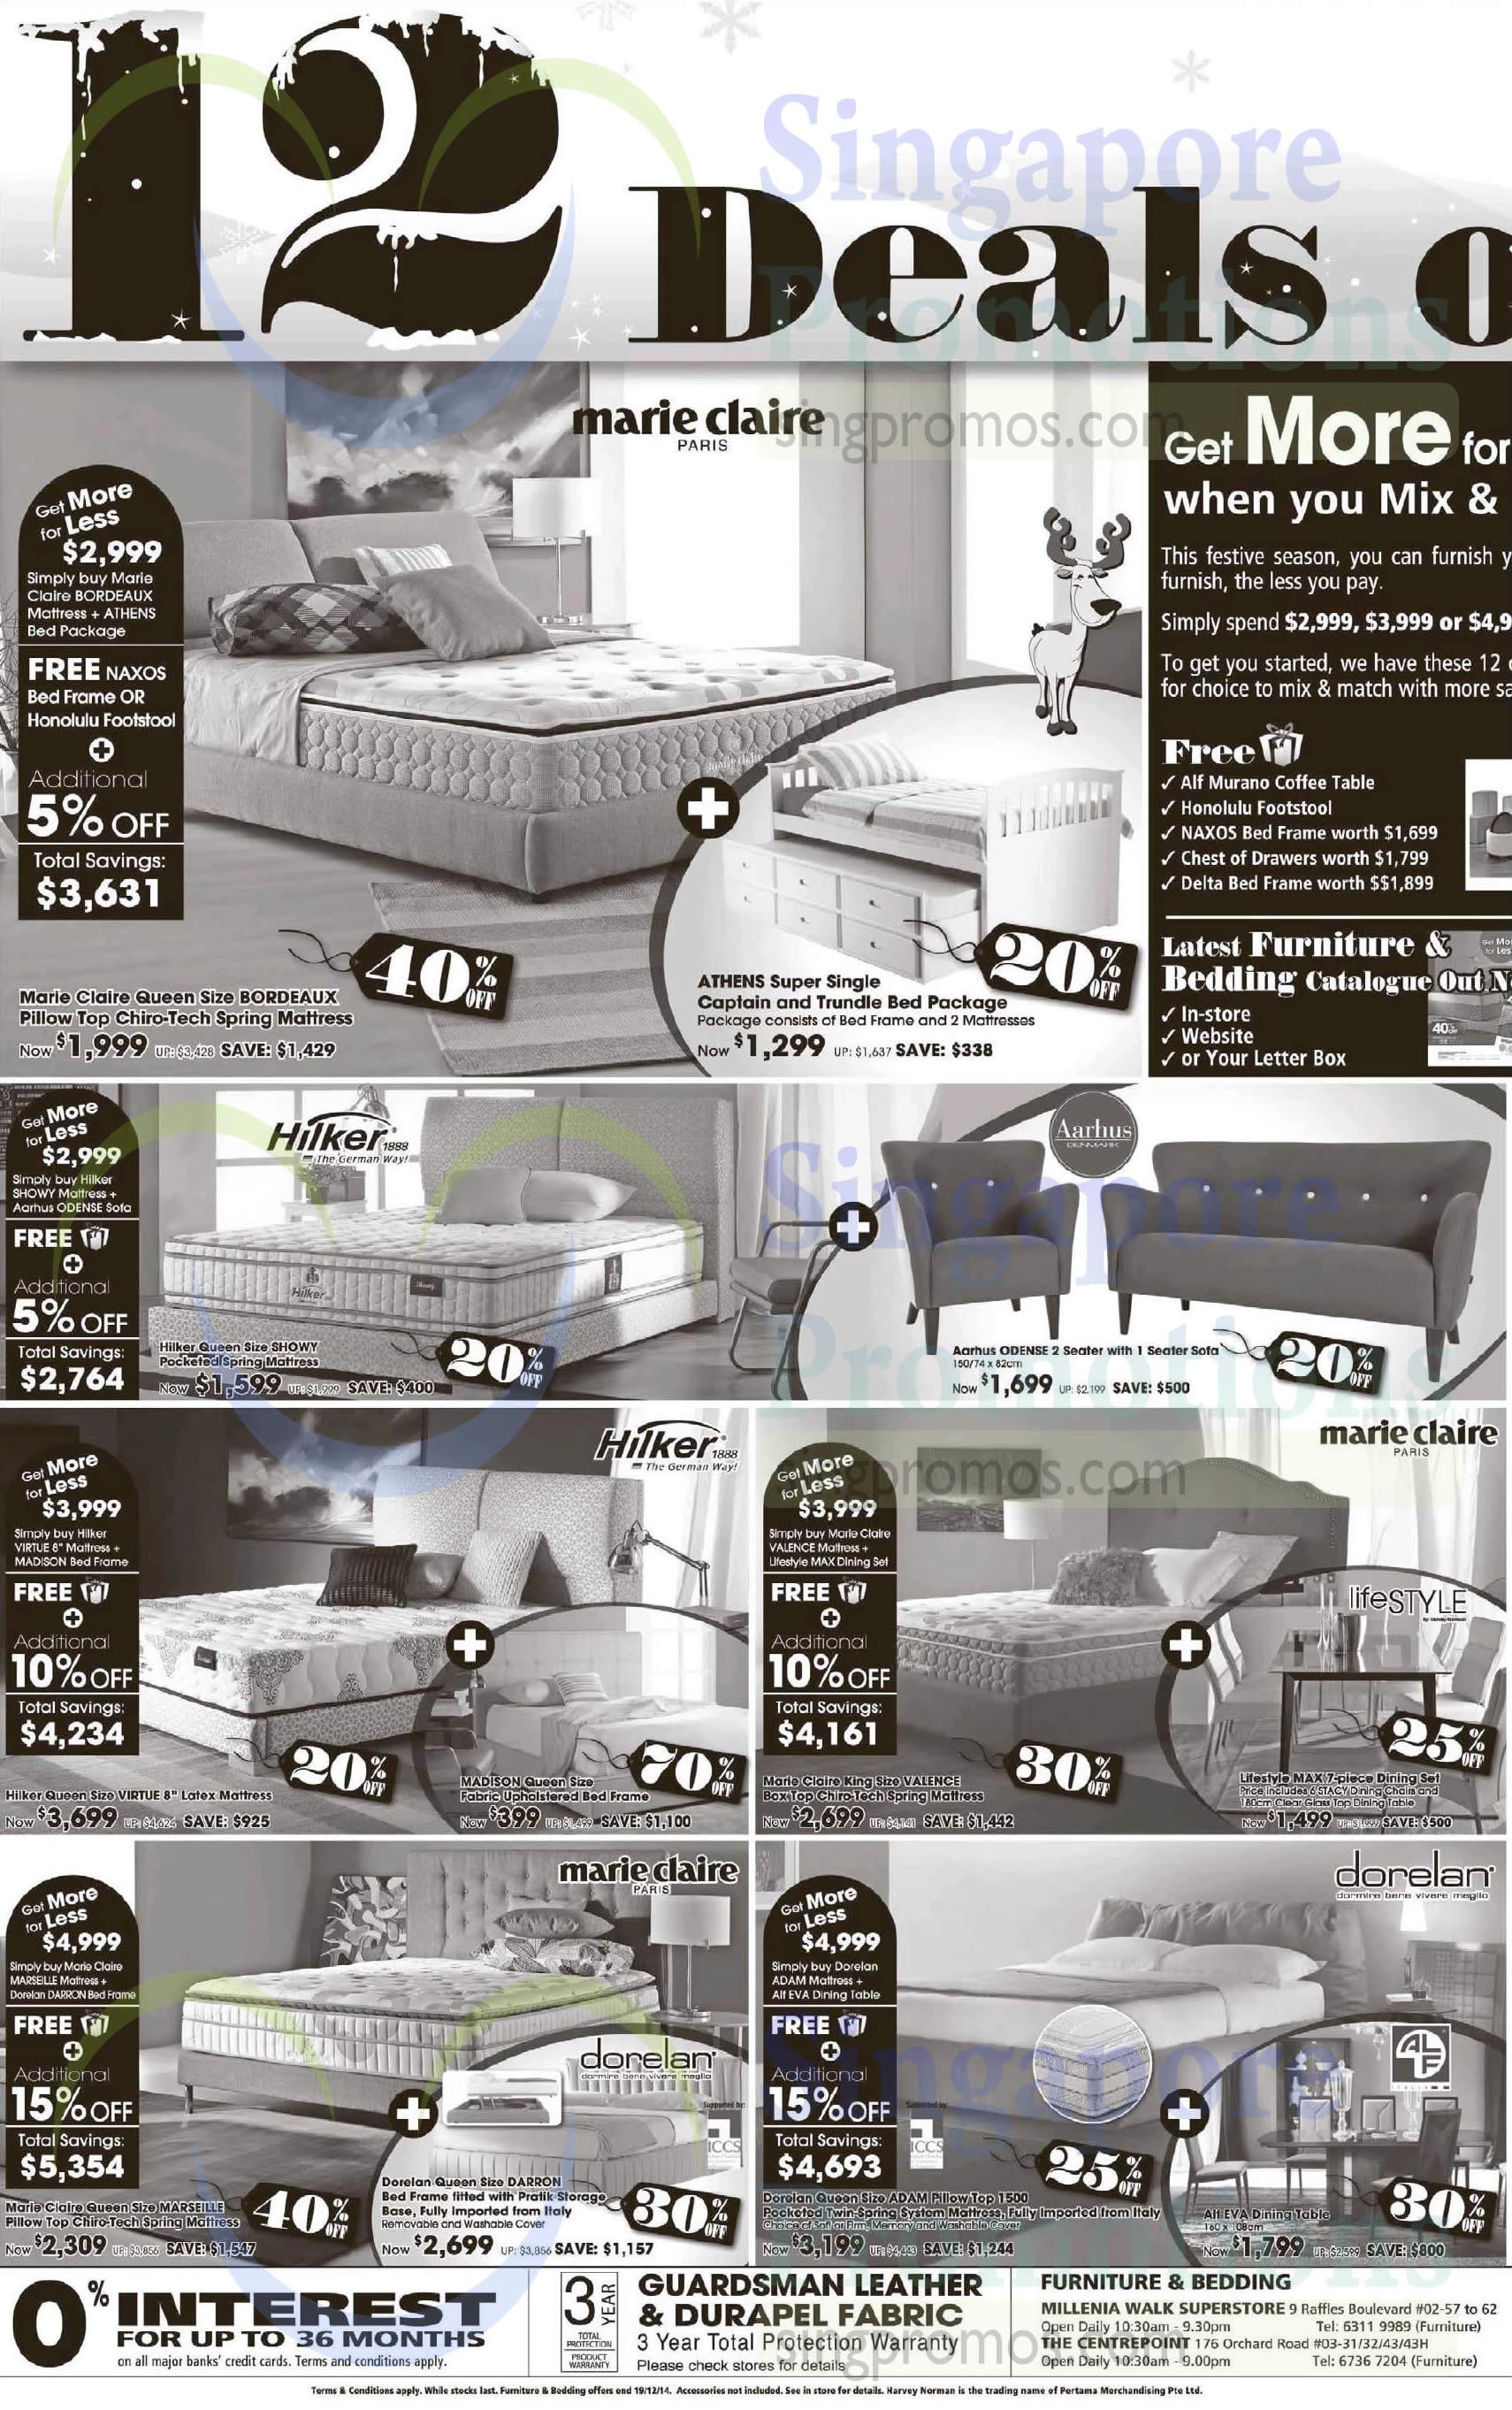 Bedding Furniture Mattresses Bed Frames Sofas Dining Table Marie Claire Hilker Aarhus Lifestyle Dorelan